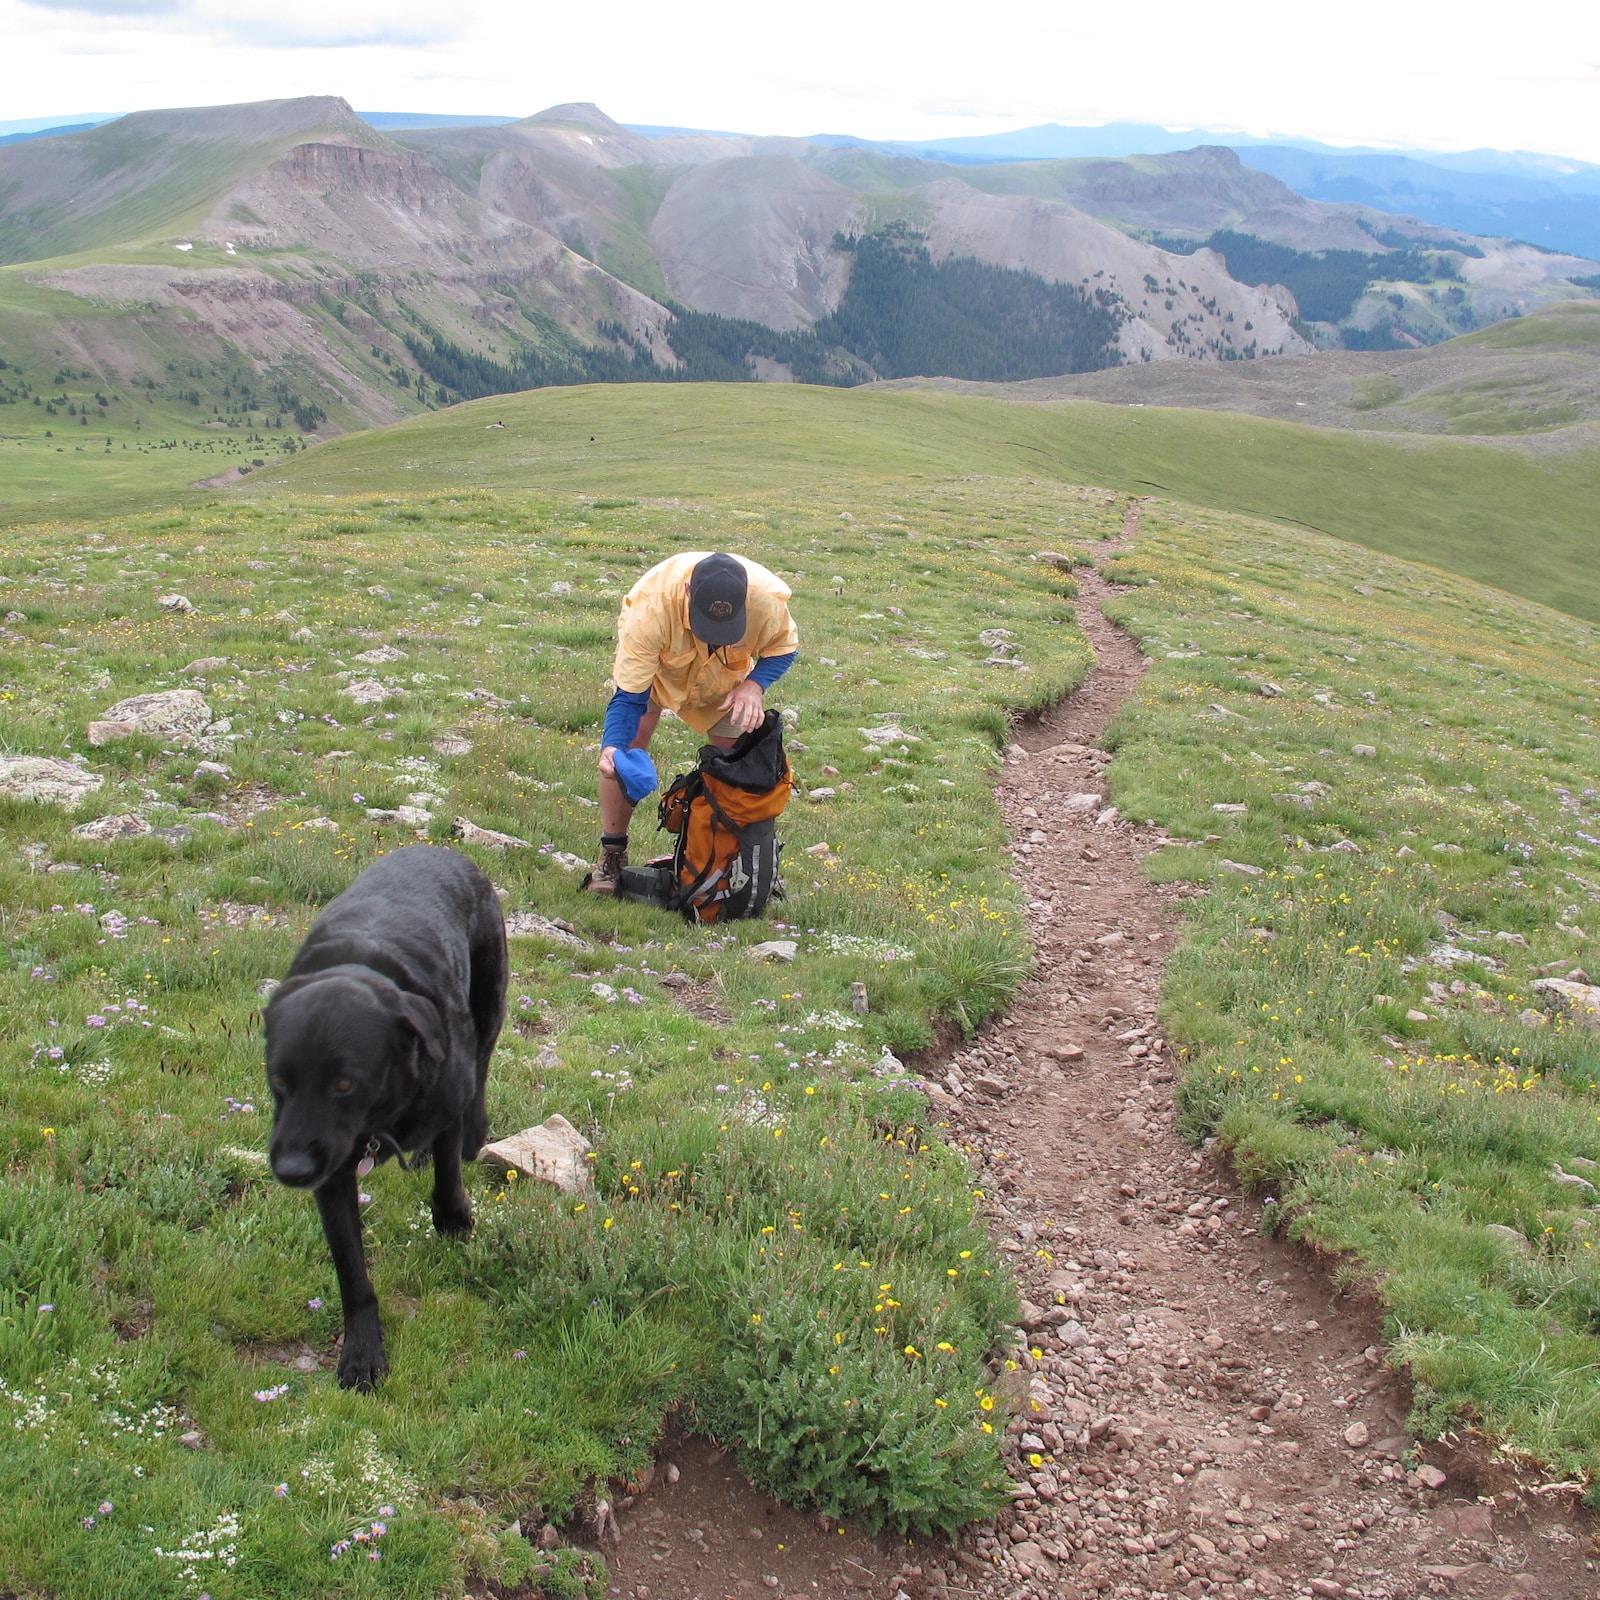 Hiking Trail Uncompahgre Peak Colorado